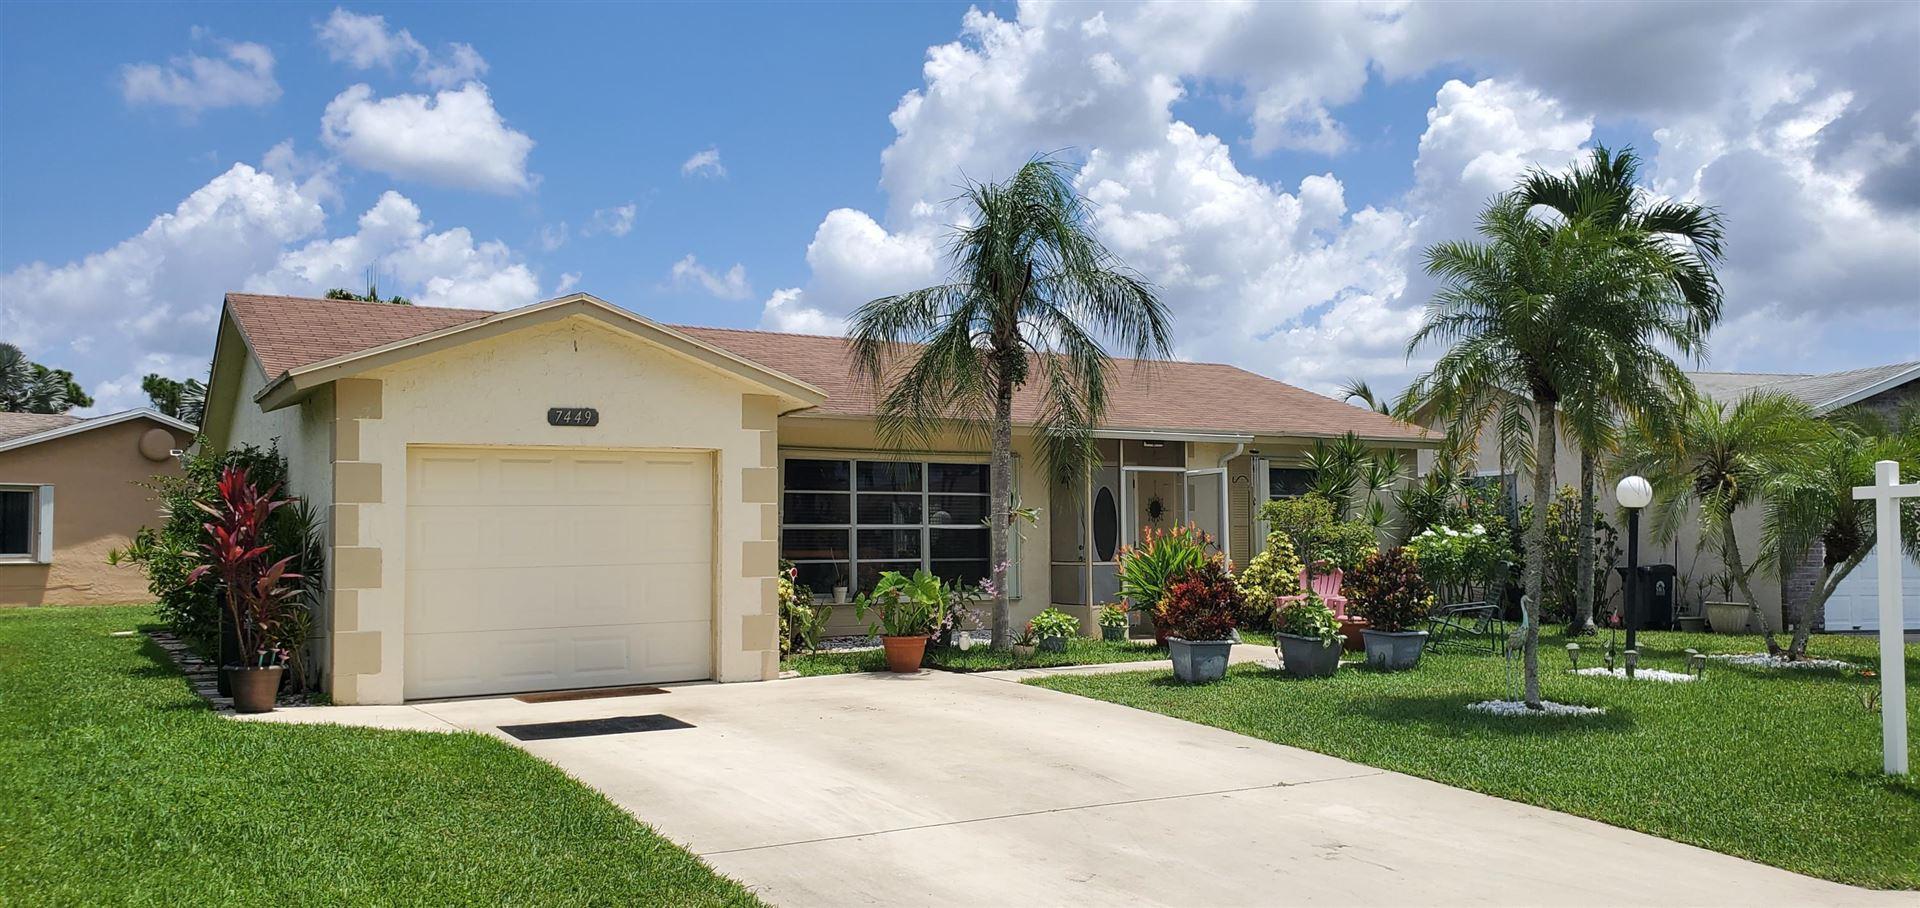 7449 Pine Park Drive S, Lake Worth, FL 33467 - #: RX-10632060